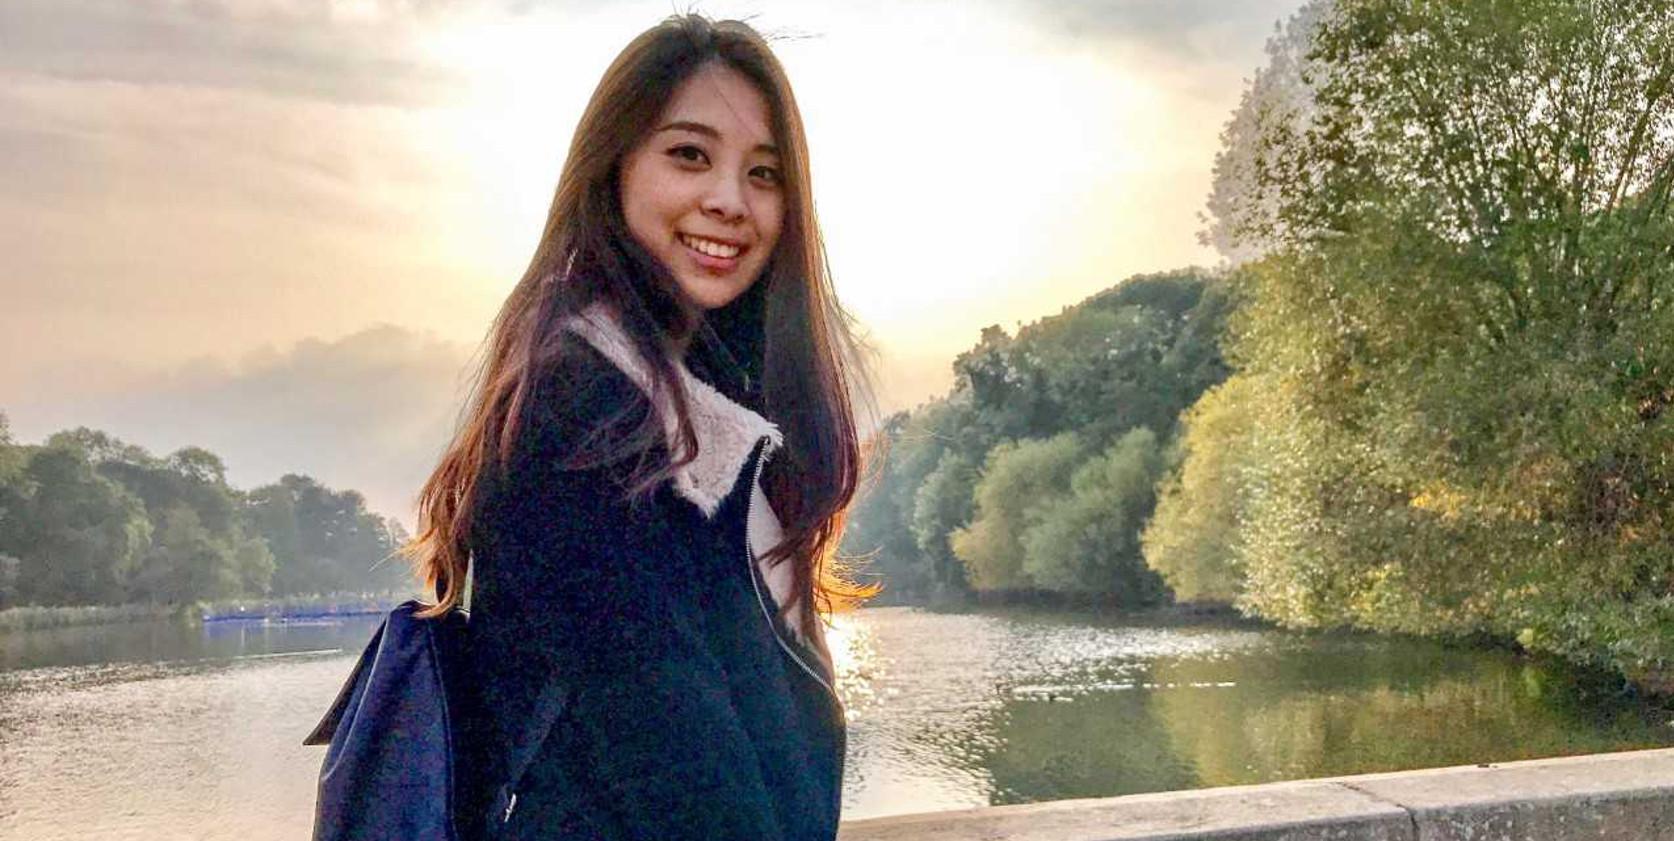 Photograph of alumna Joey